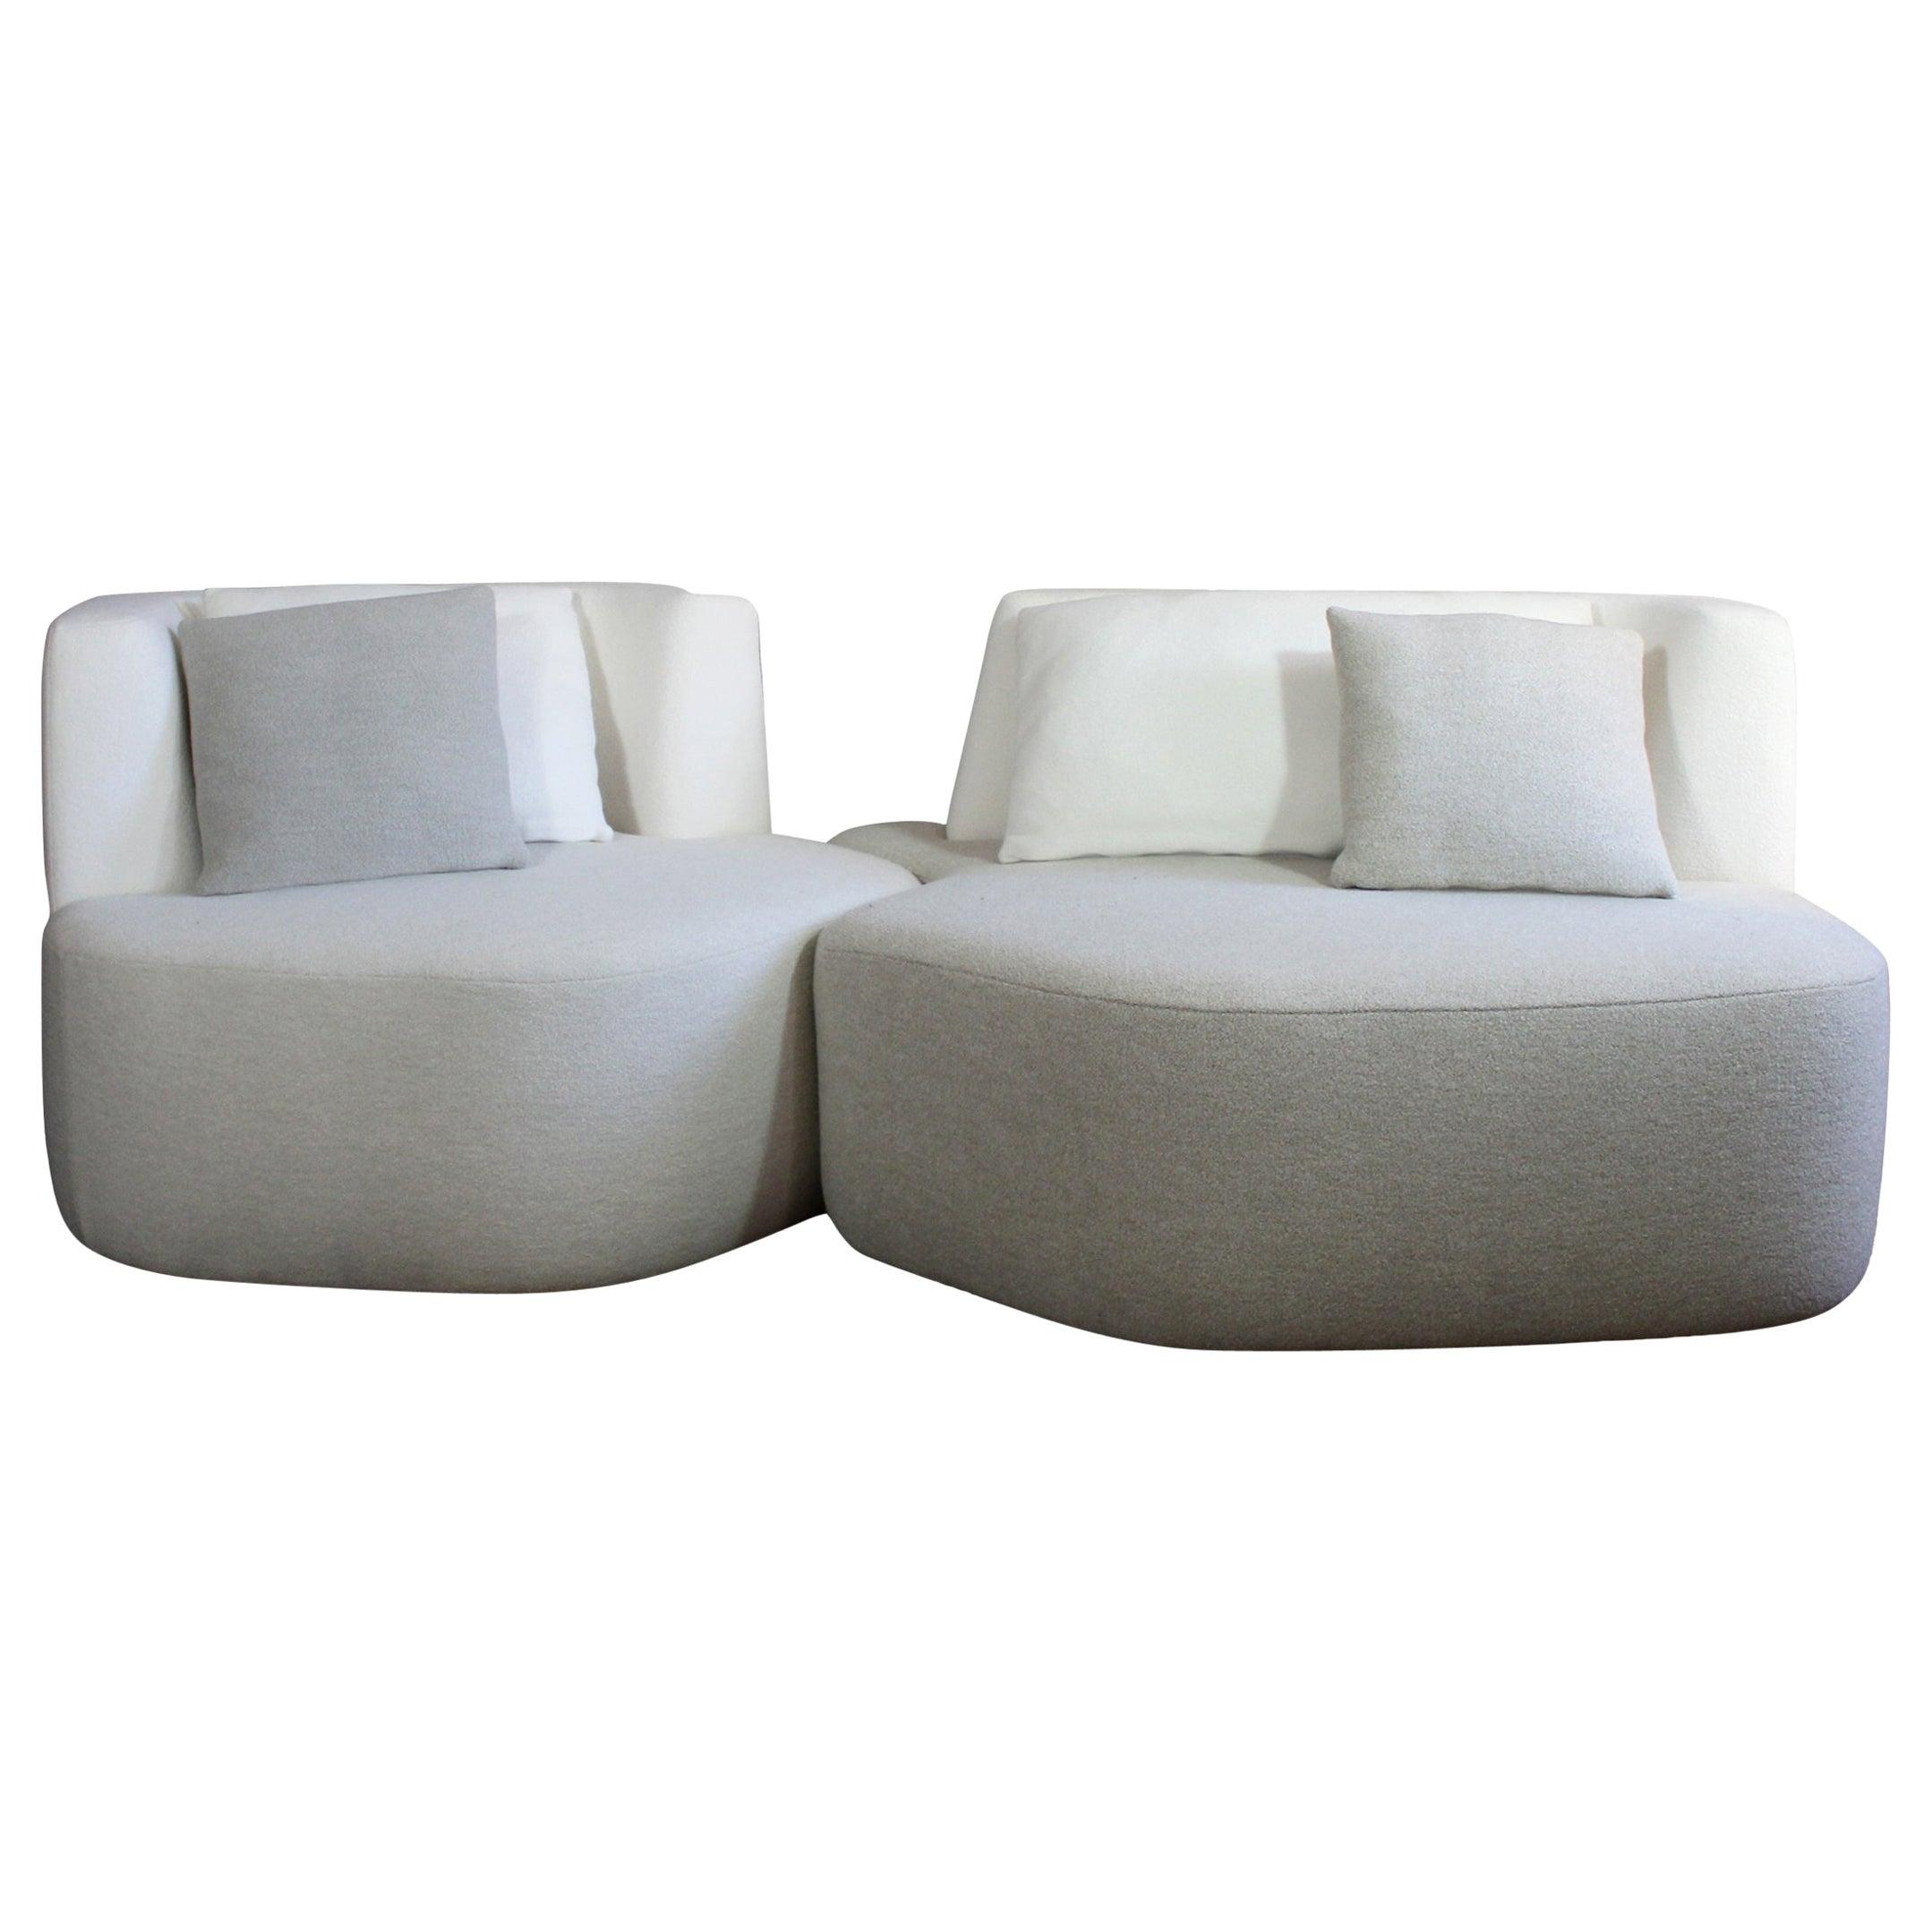 Organic Sofa Pierre in White Cream Wool 2 Modules Made in France Customizable